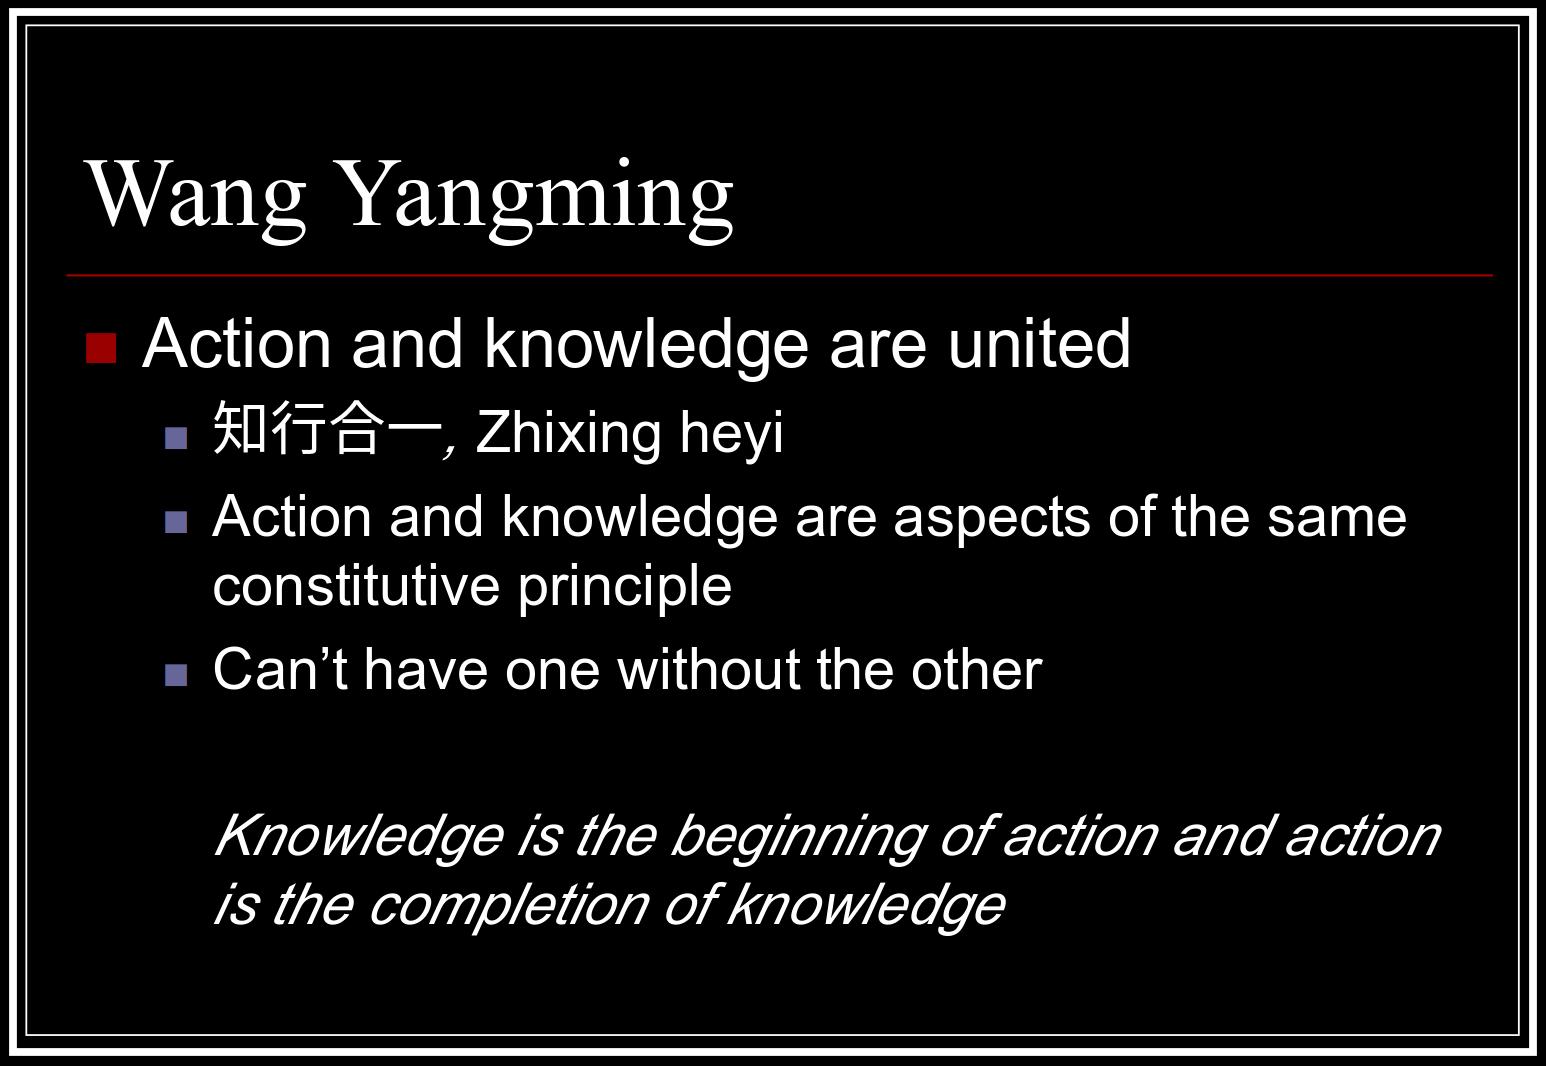 Wang Yangming